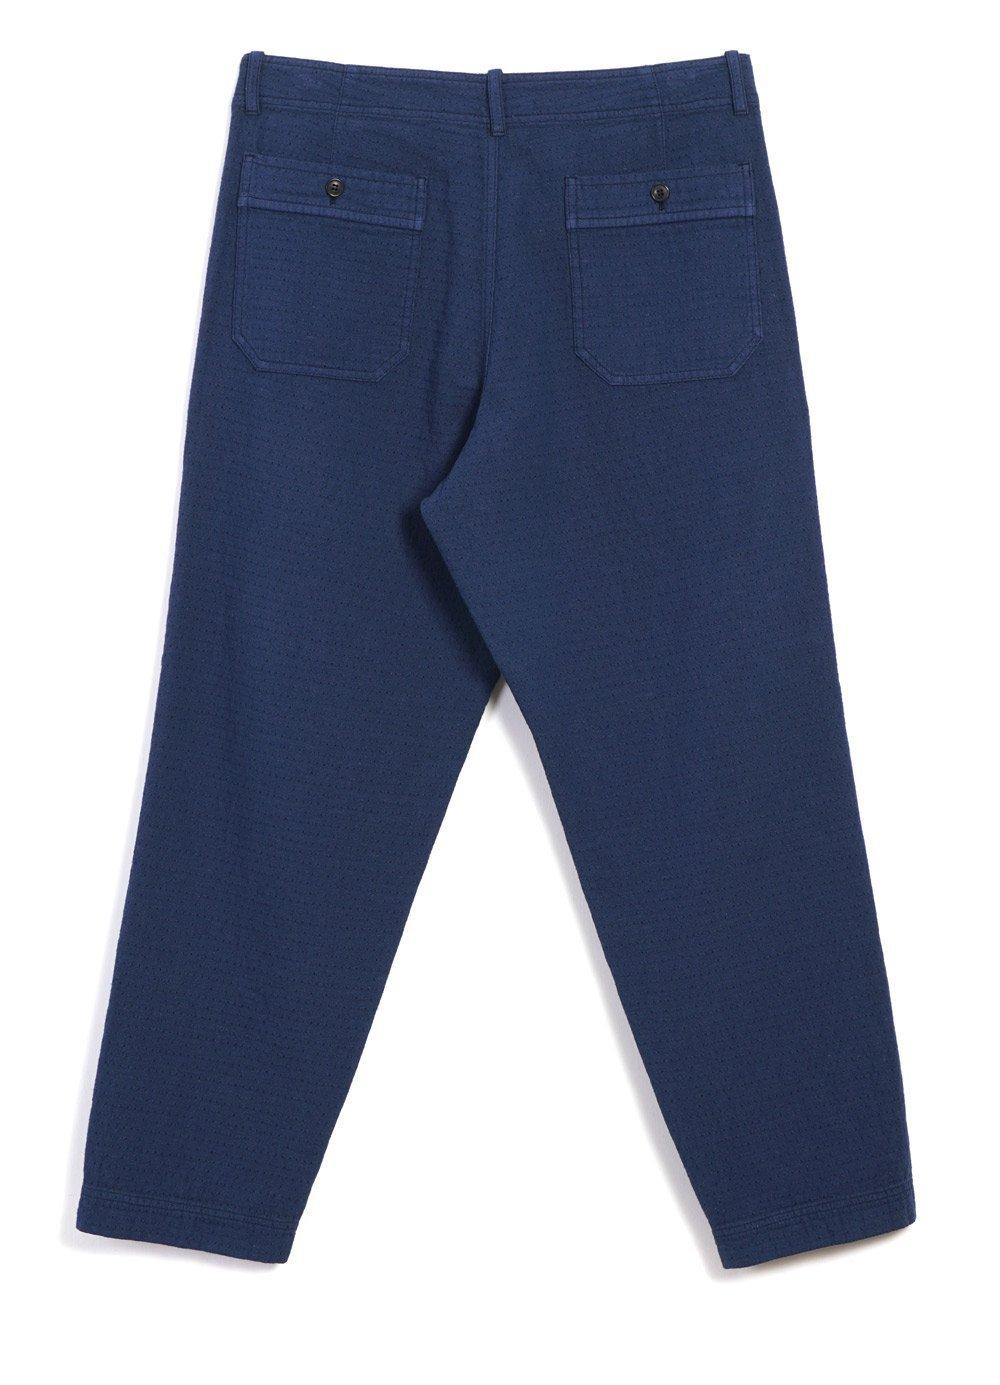 Hansen Garments TRYGVE | Wide Cut Cropped Trousers | Blue